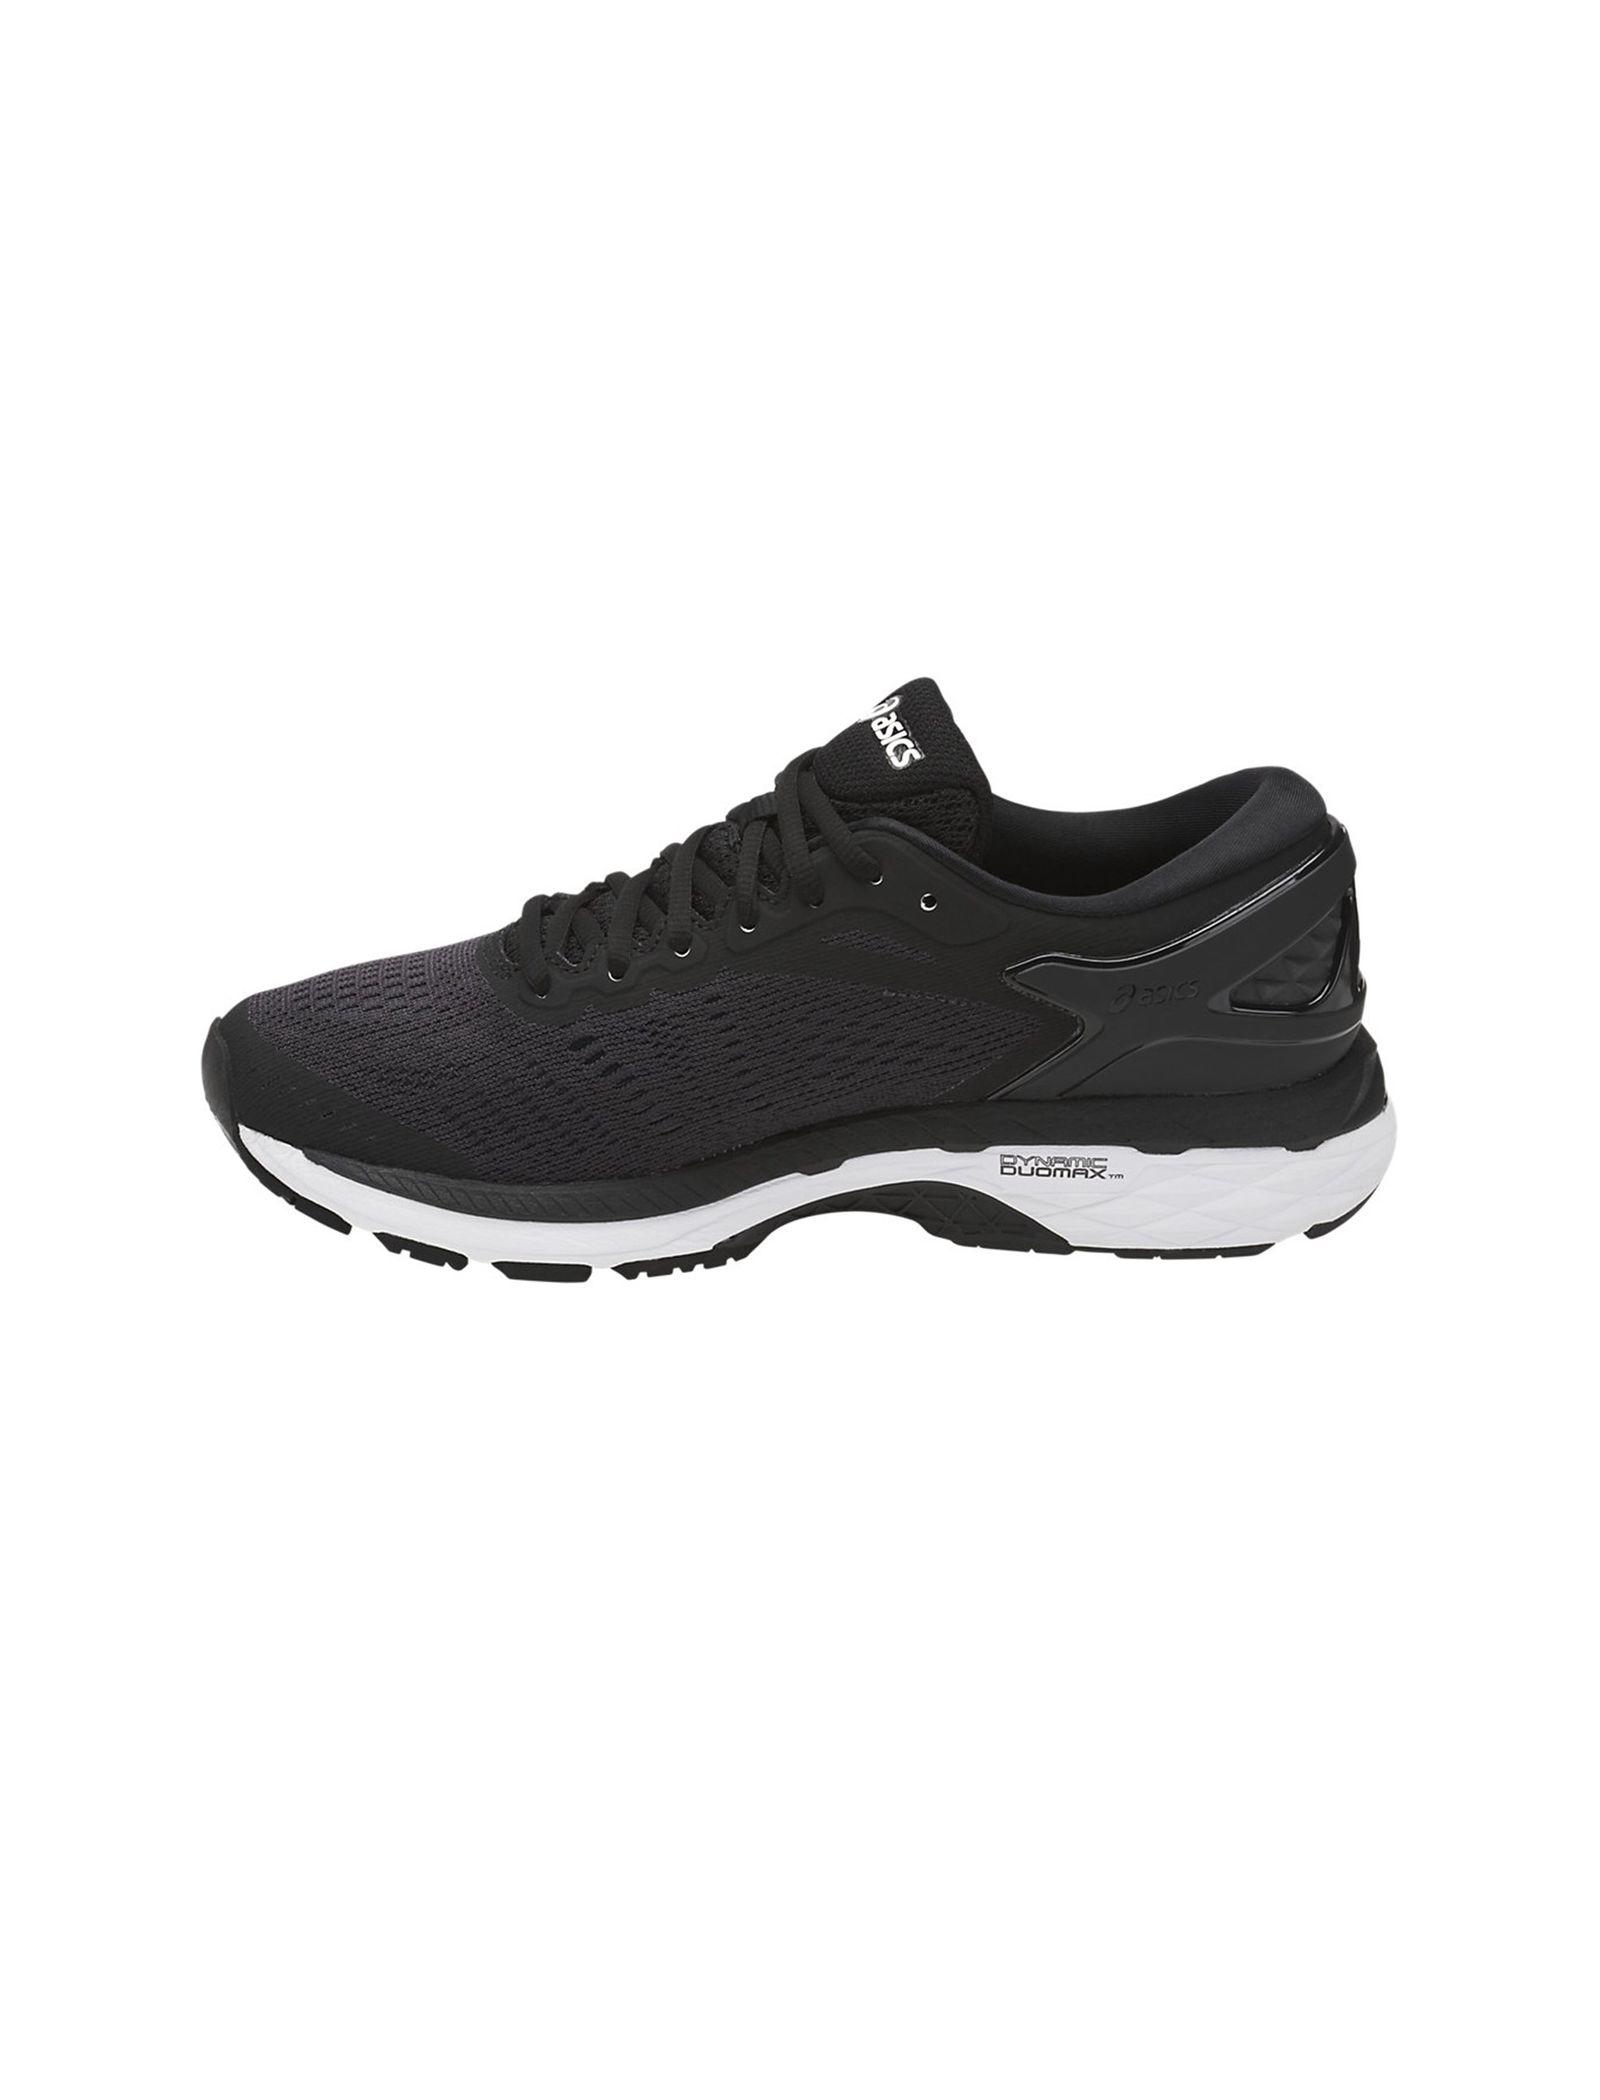 کفش دویدن بندی زنانه GEL-KAYANO 24 - اسیکس - مشکي - 7